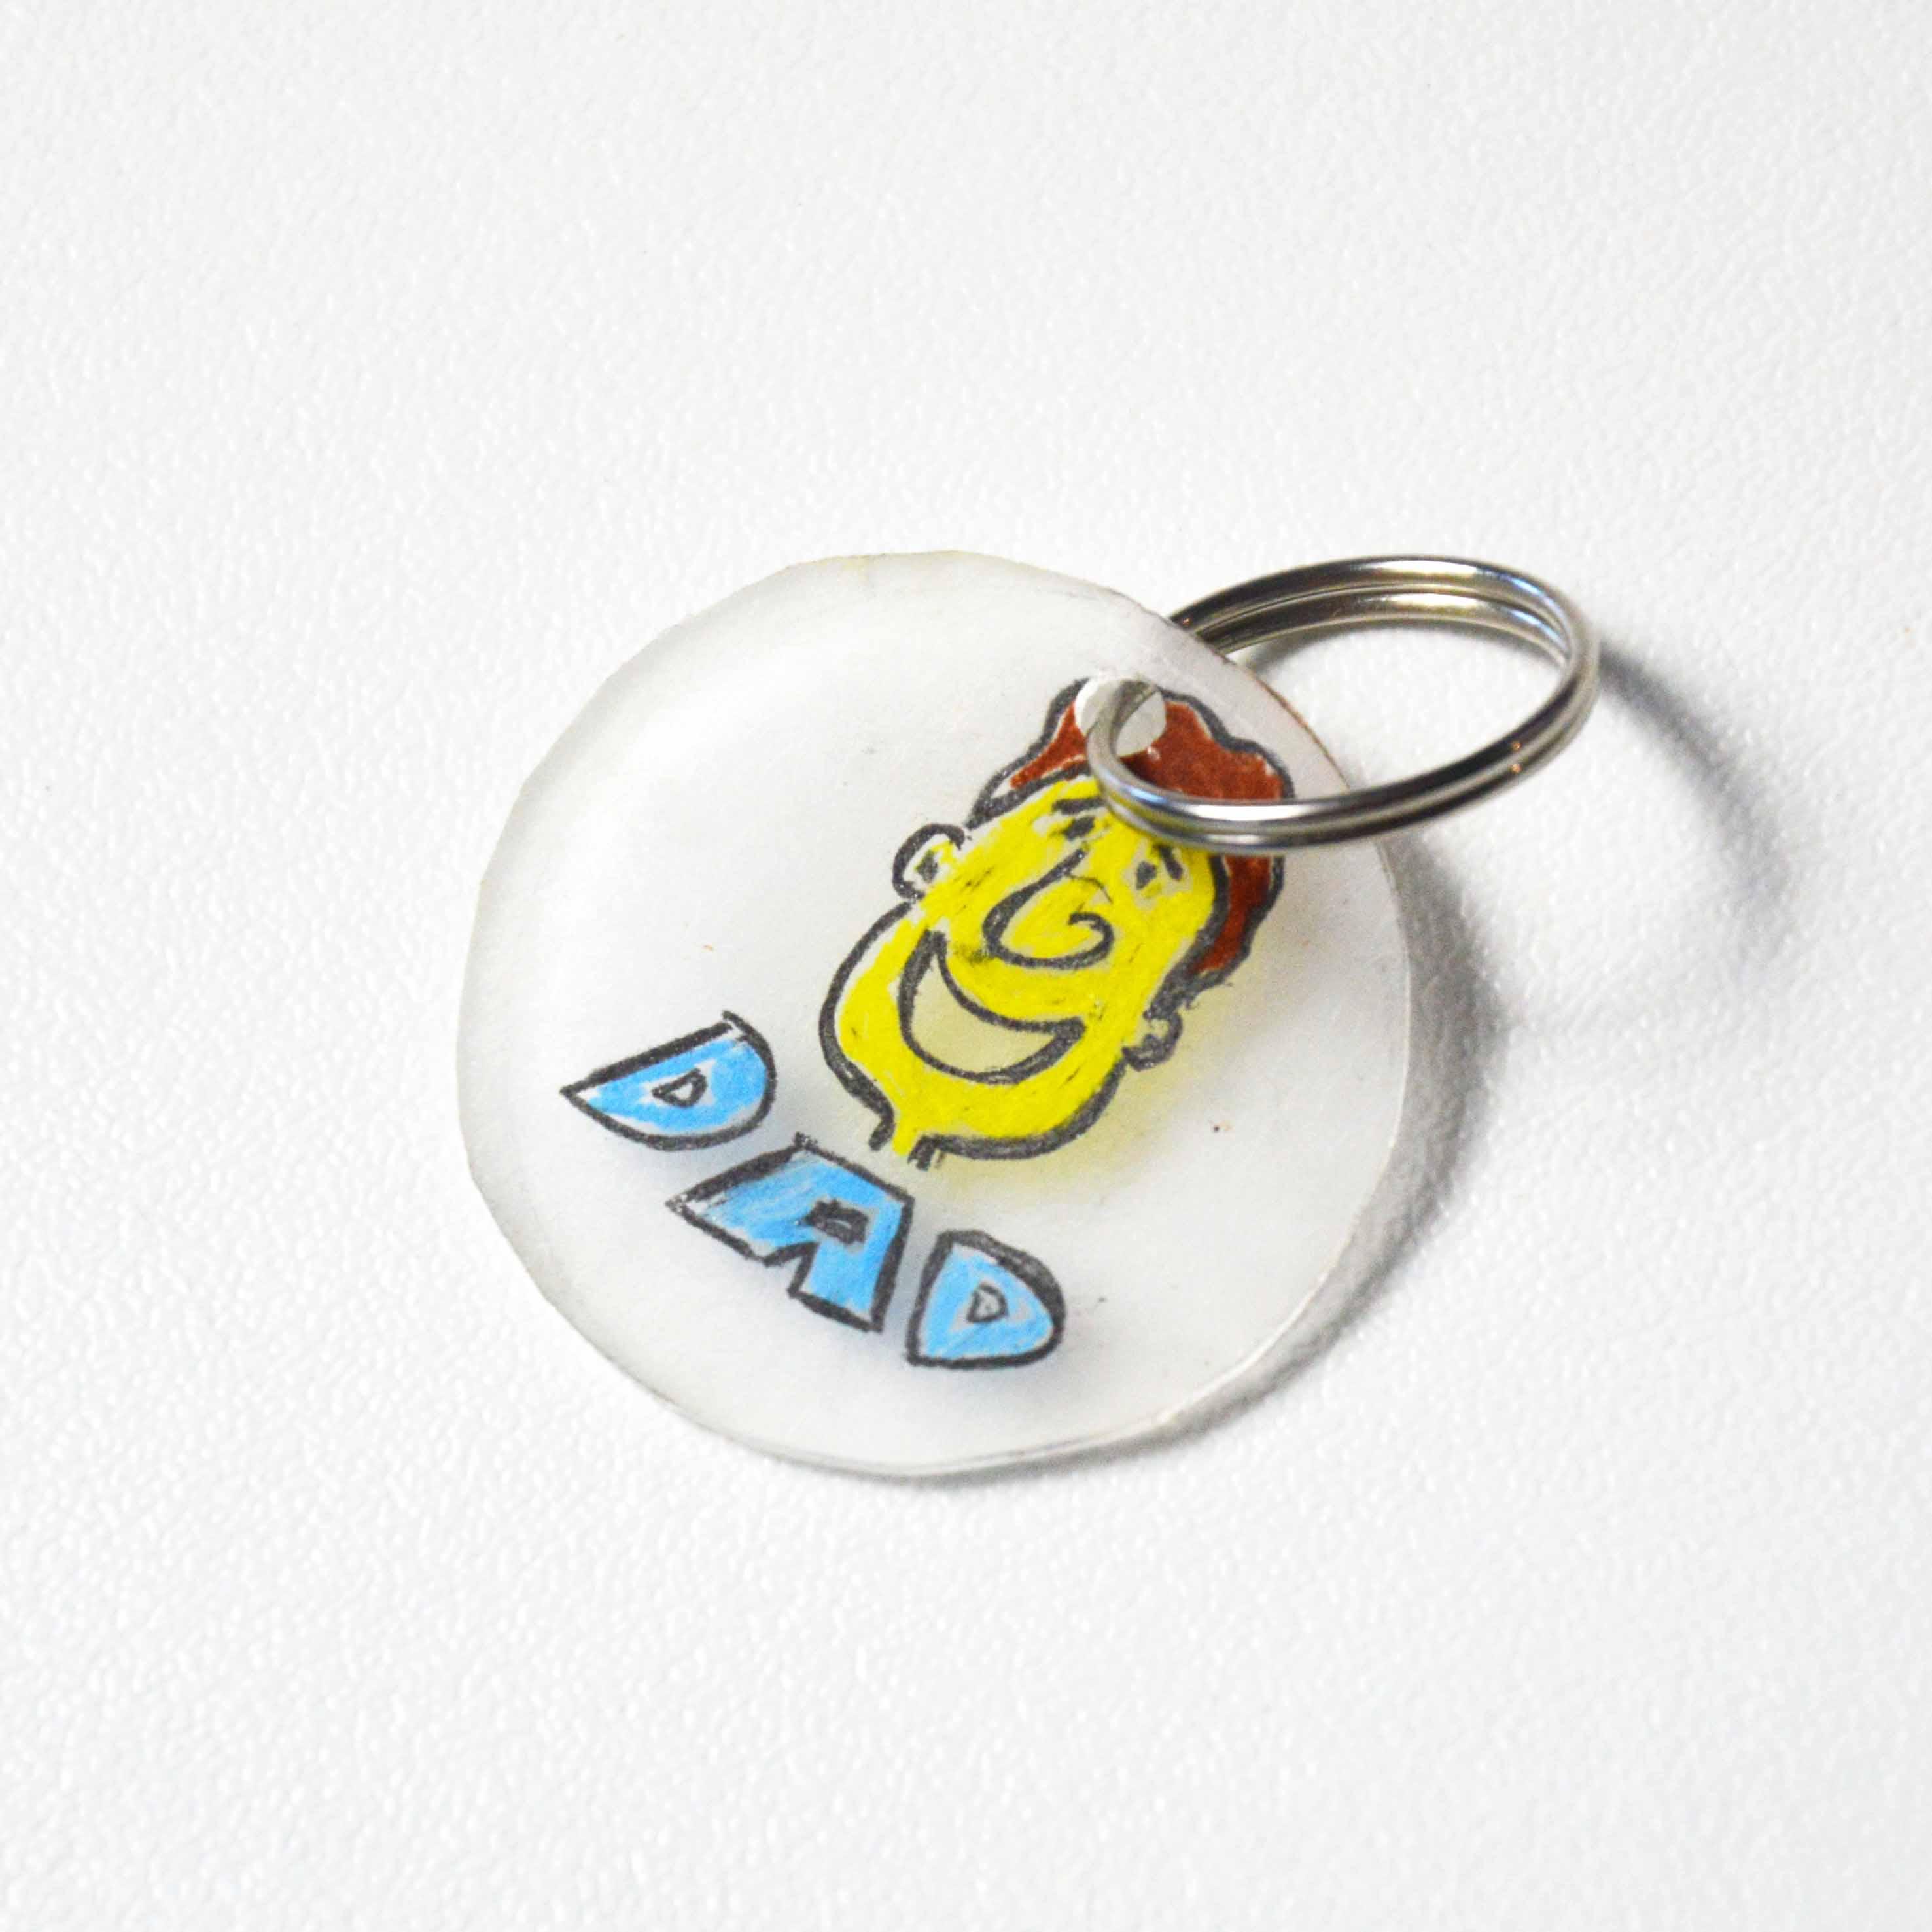 Make a key ring using shrink art